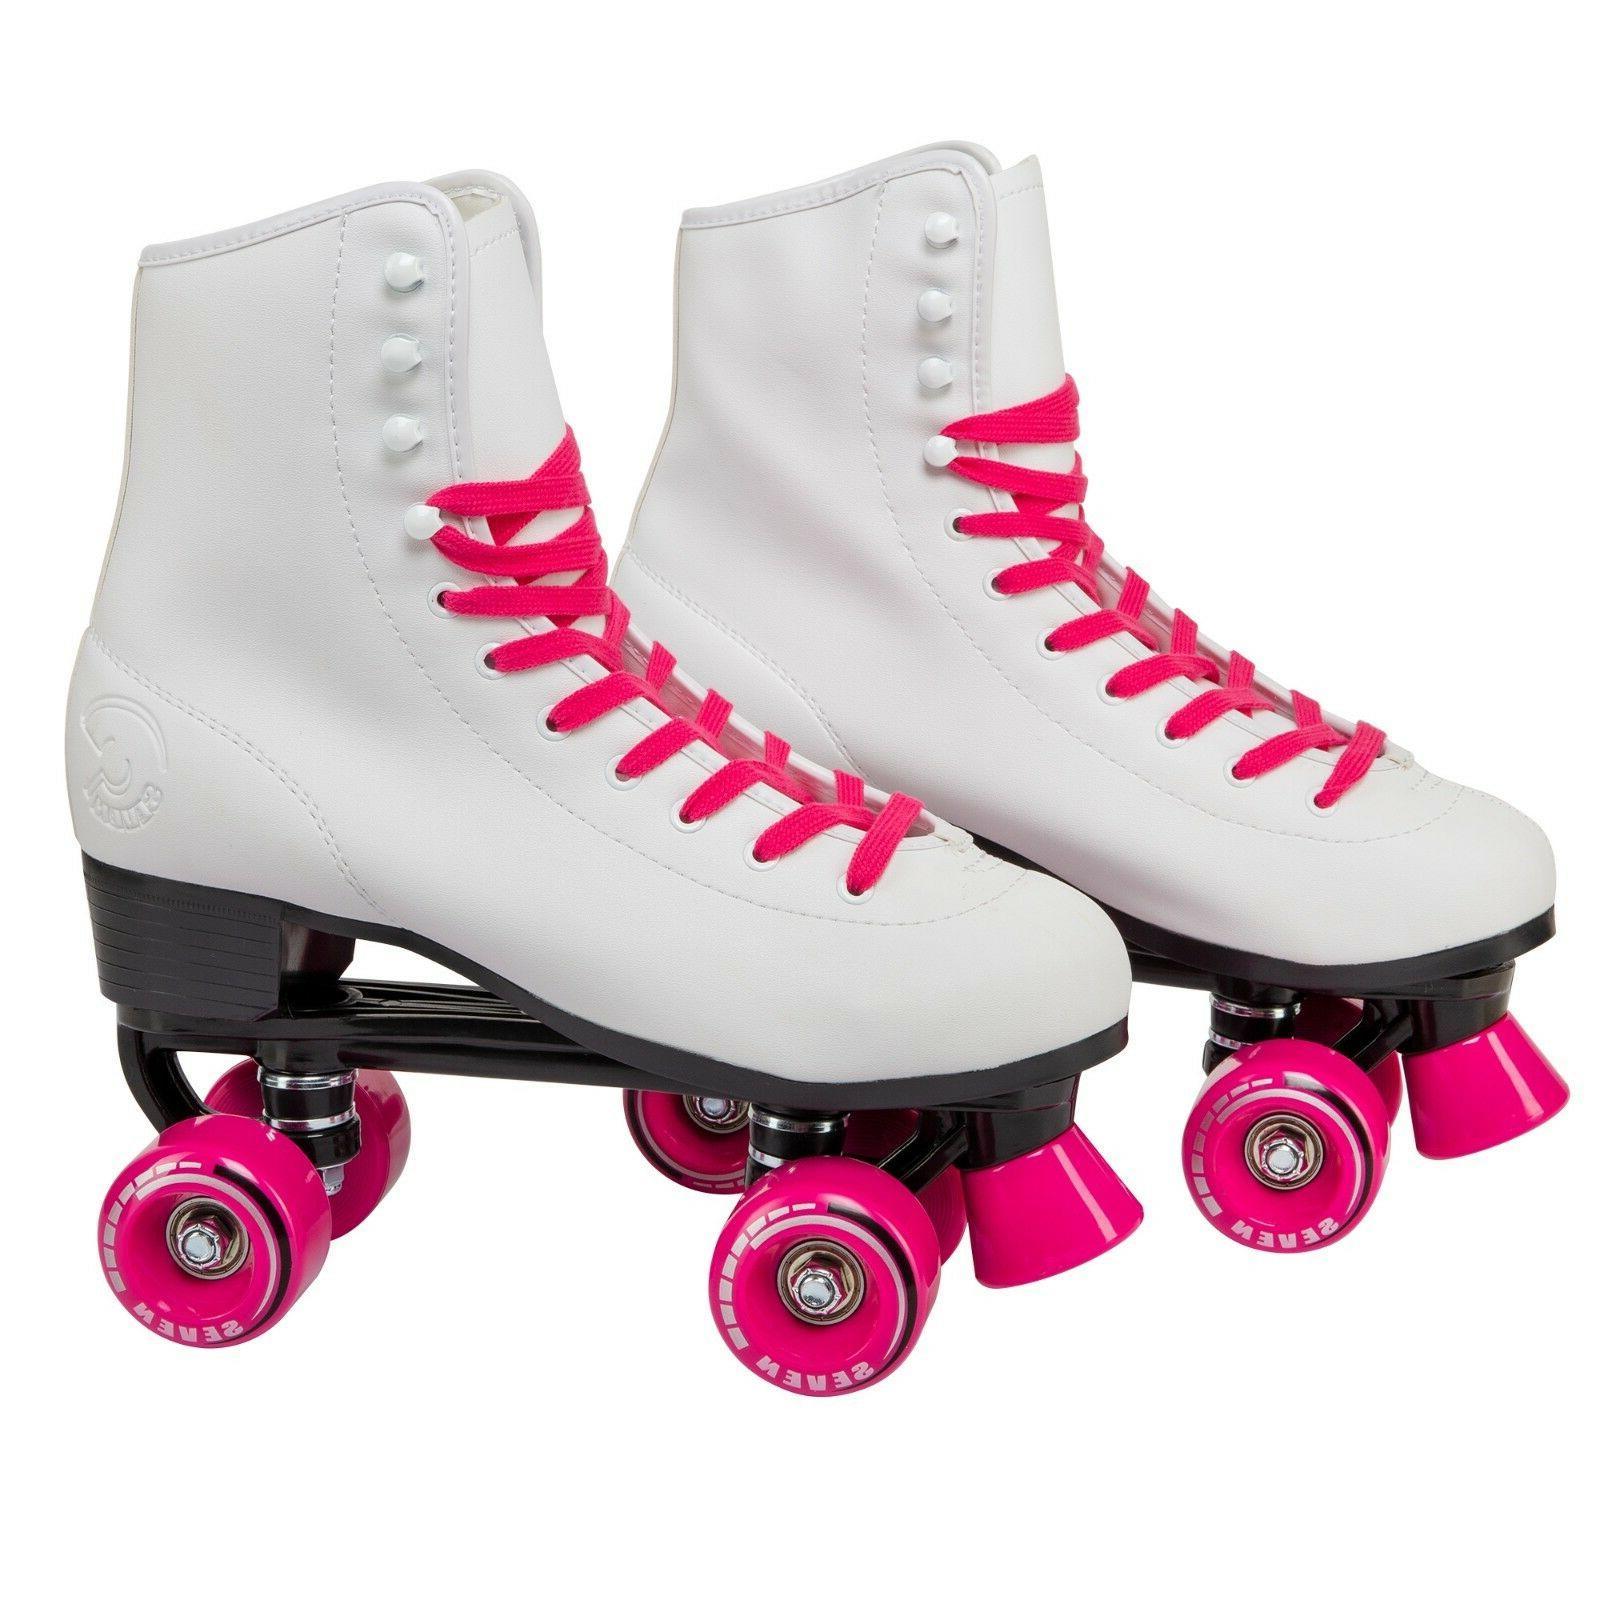 C7skates Soft Roller Skates, Gifts for